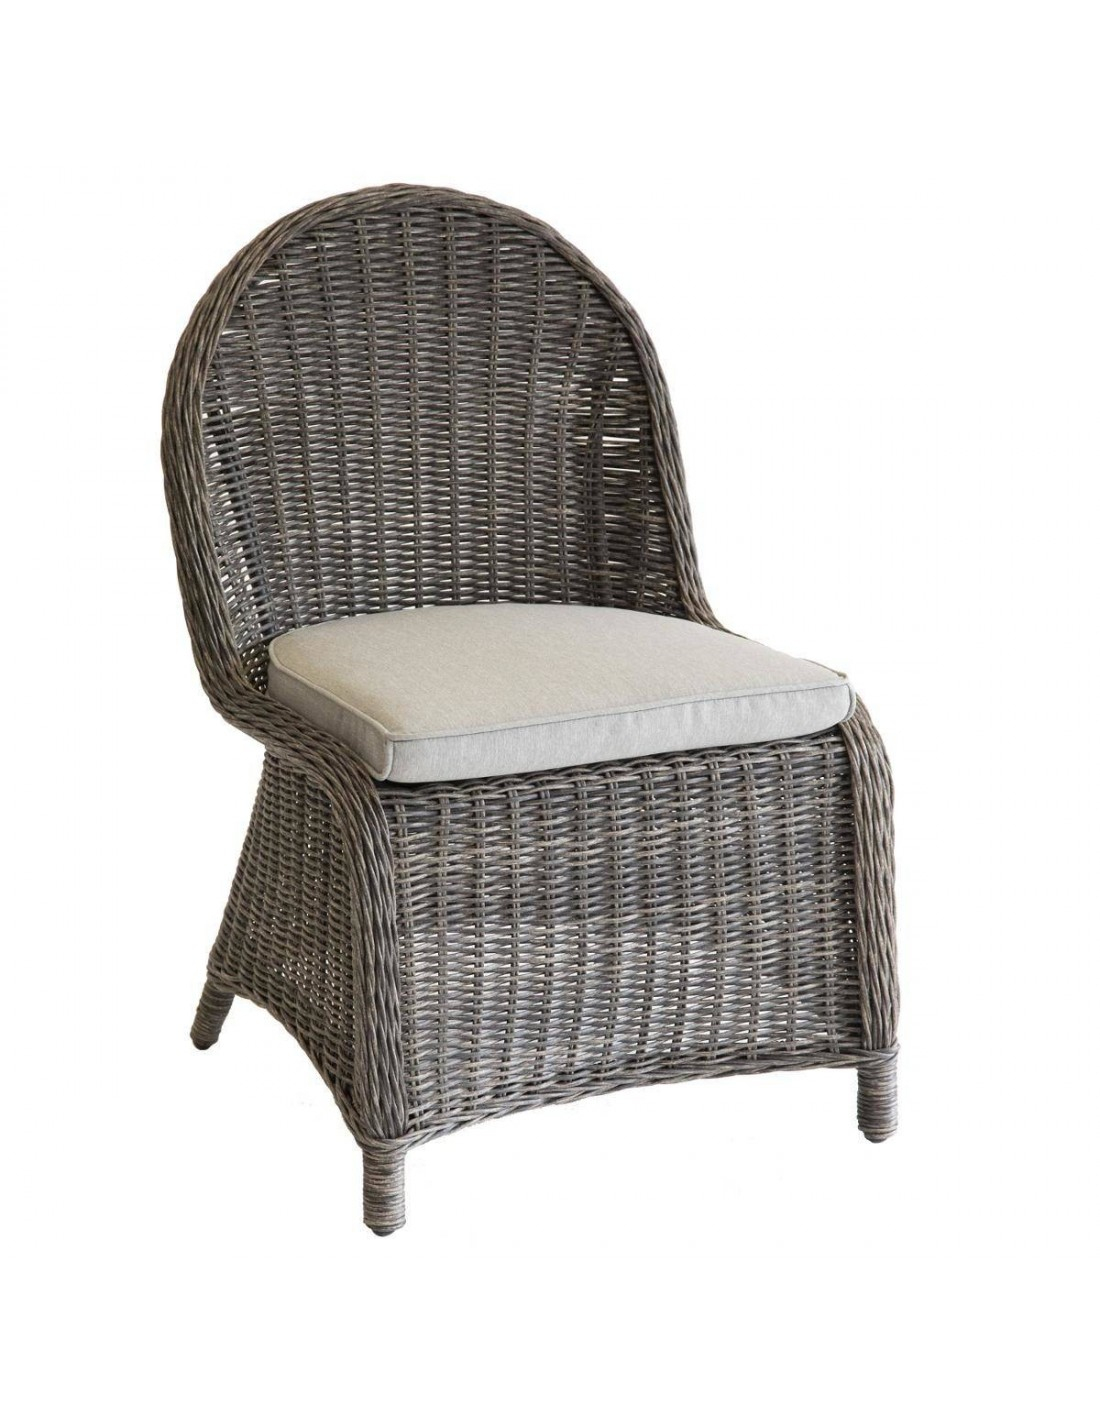 Chaise De Jardin Bétong - Aluminium En Résine Tressée - Hespéride destiné Chaise De Jardin Hesperide